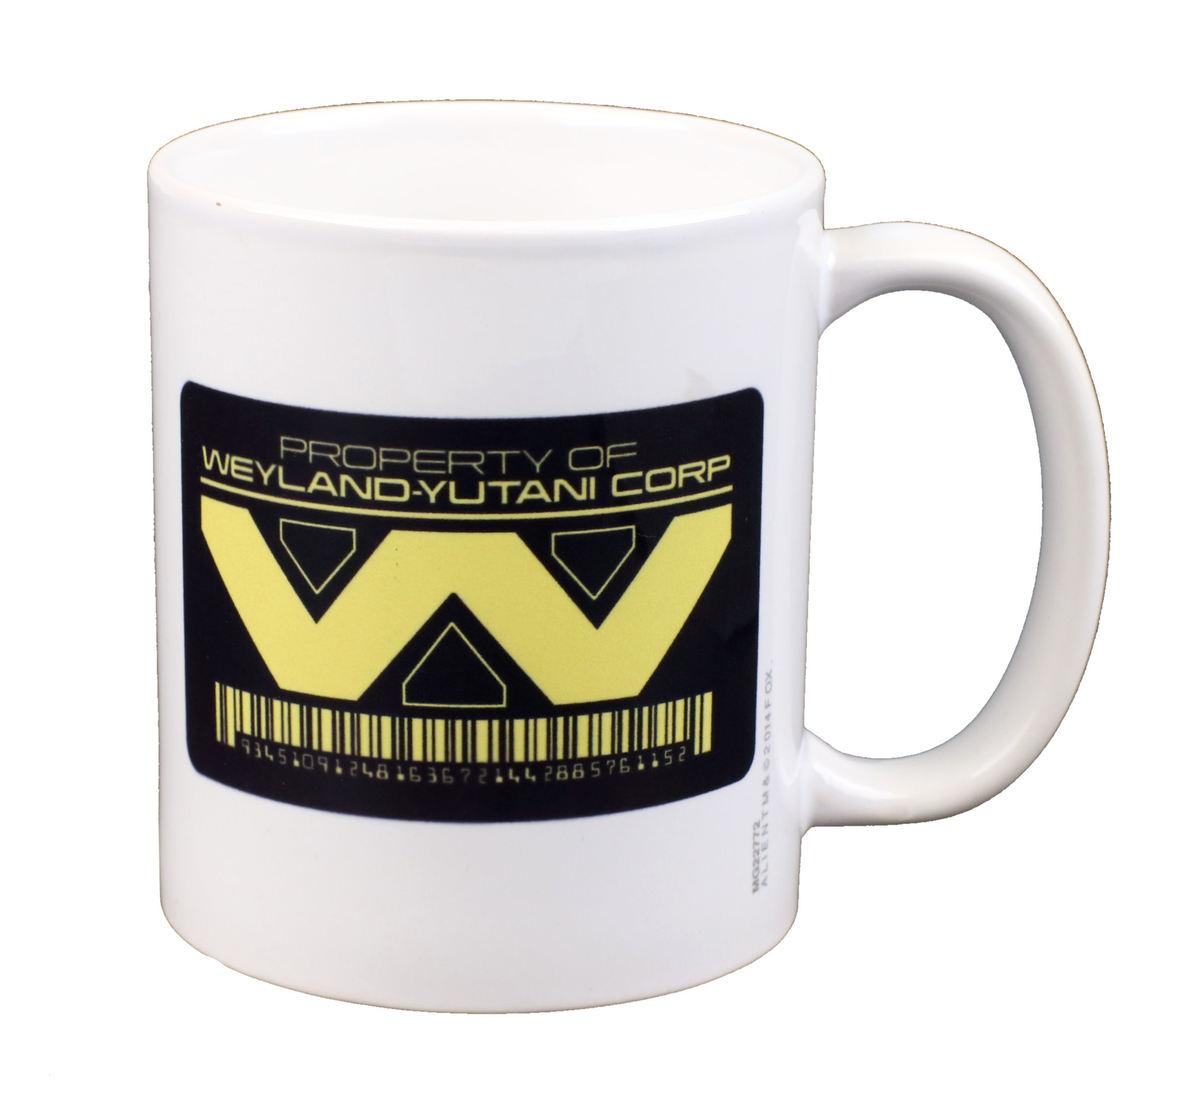 hrnček Alien - Vetřelec - Weyland Yutani Corp - PYRAMID POSTERS - MG22772